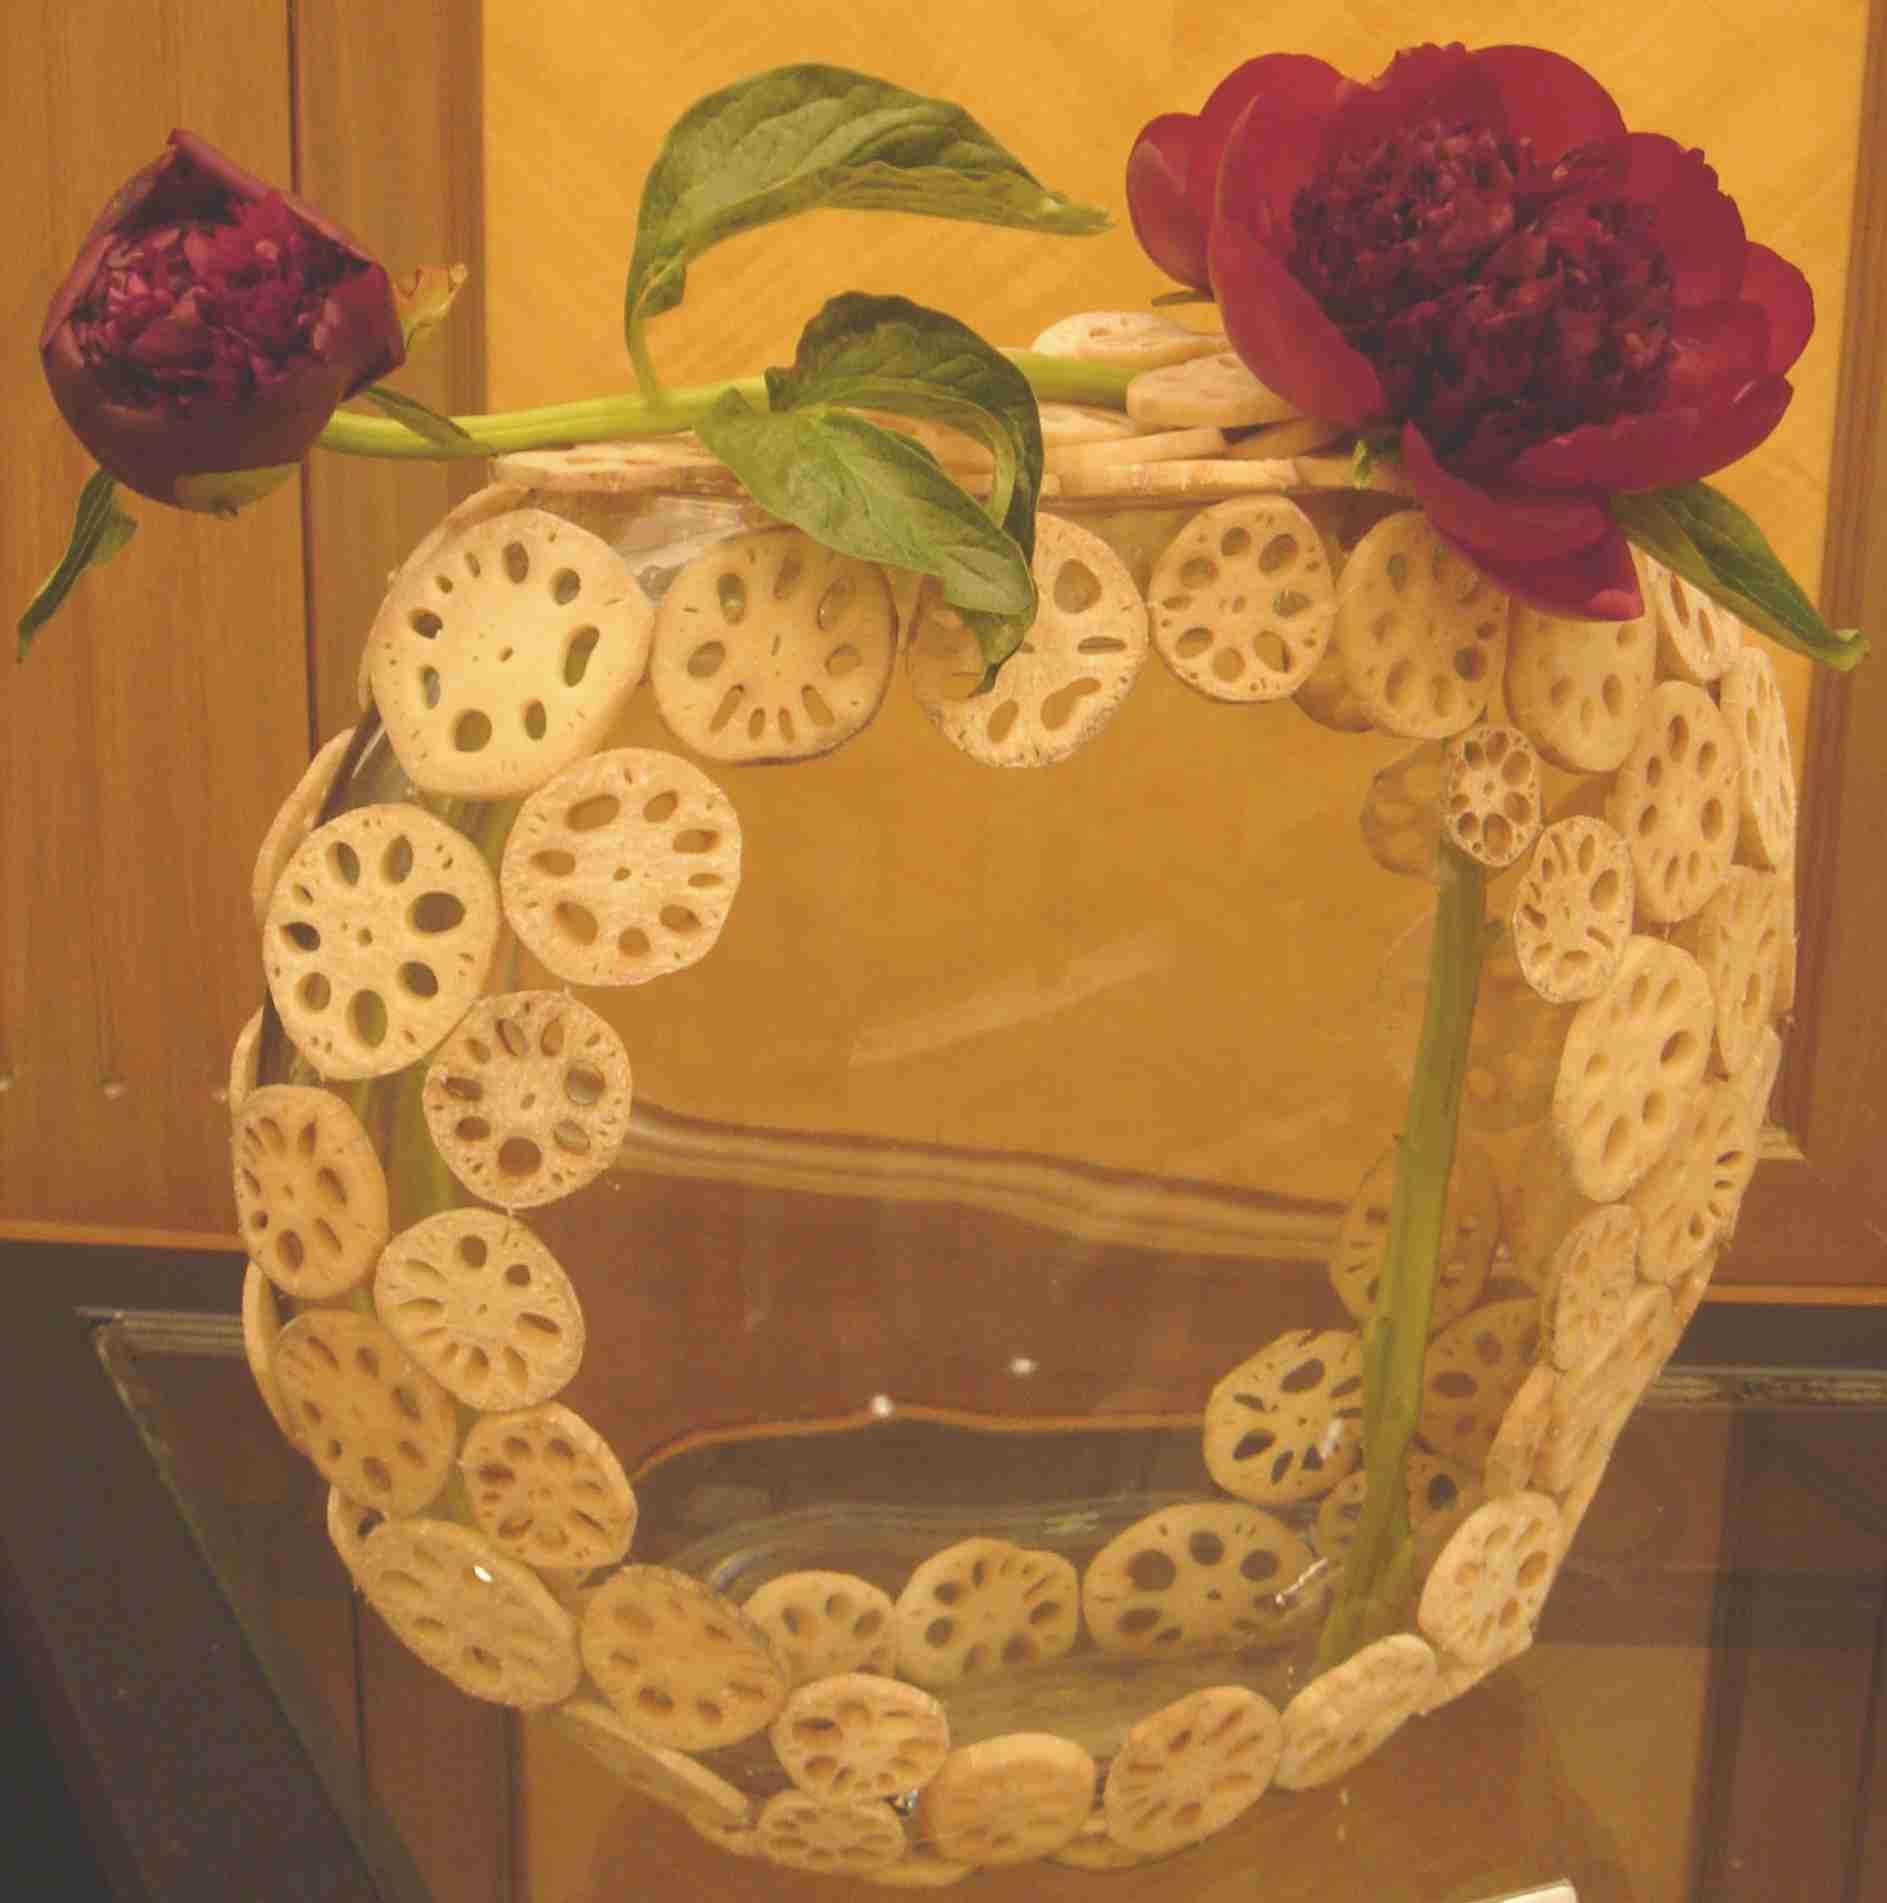 Floral design ideas   Floral Designing ideas   Pinterest   Floral ...